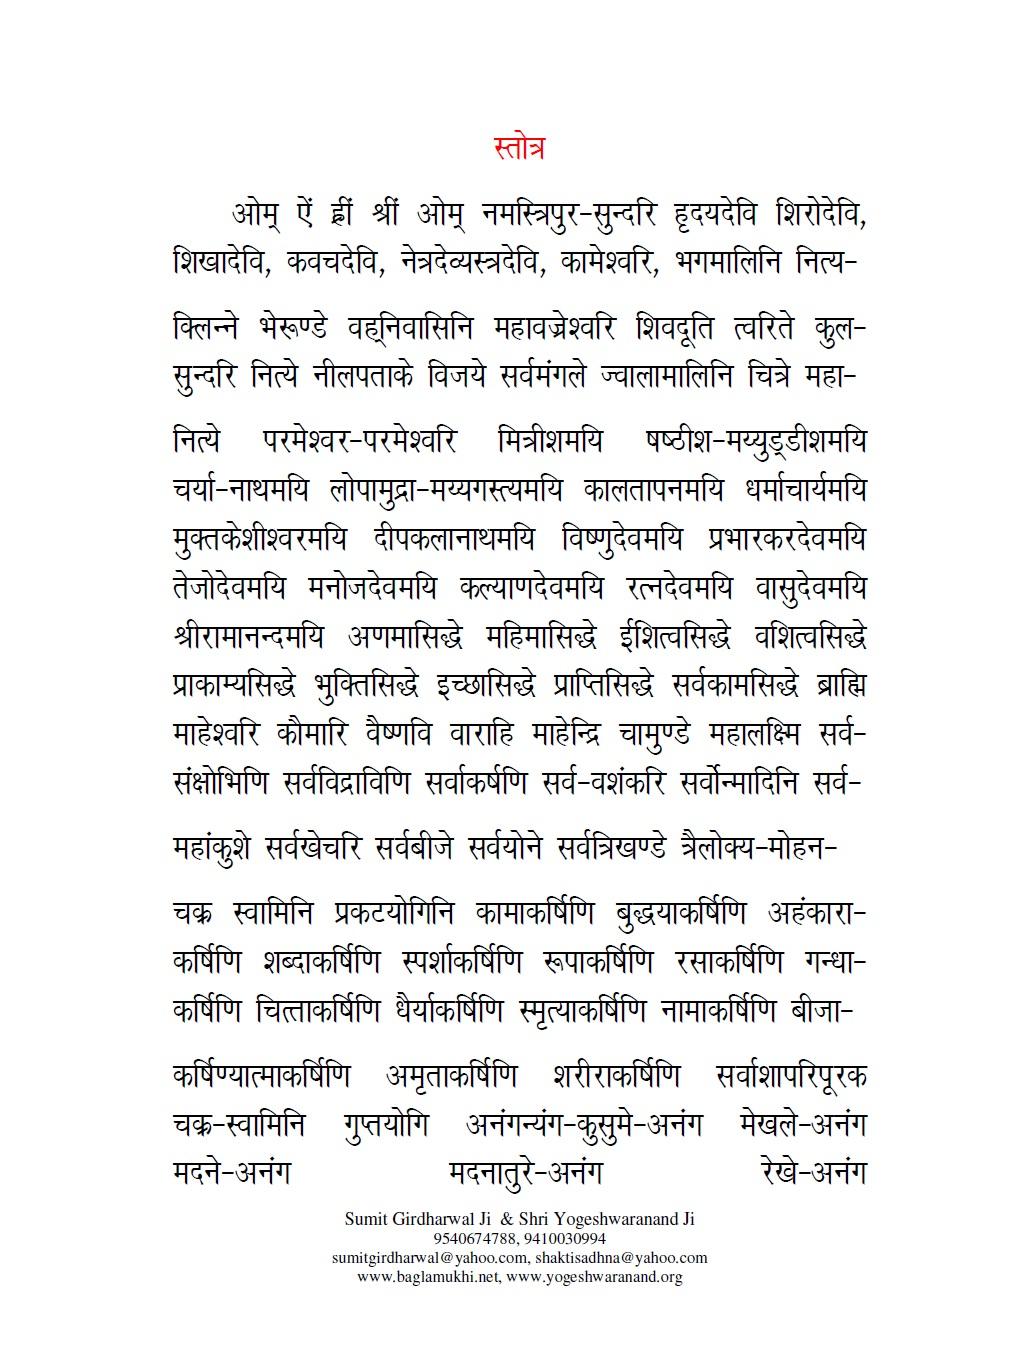 Shri Lalita Tripura Sundari Khadgamala Stotram in Sanskrit